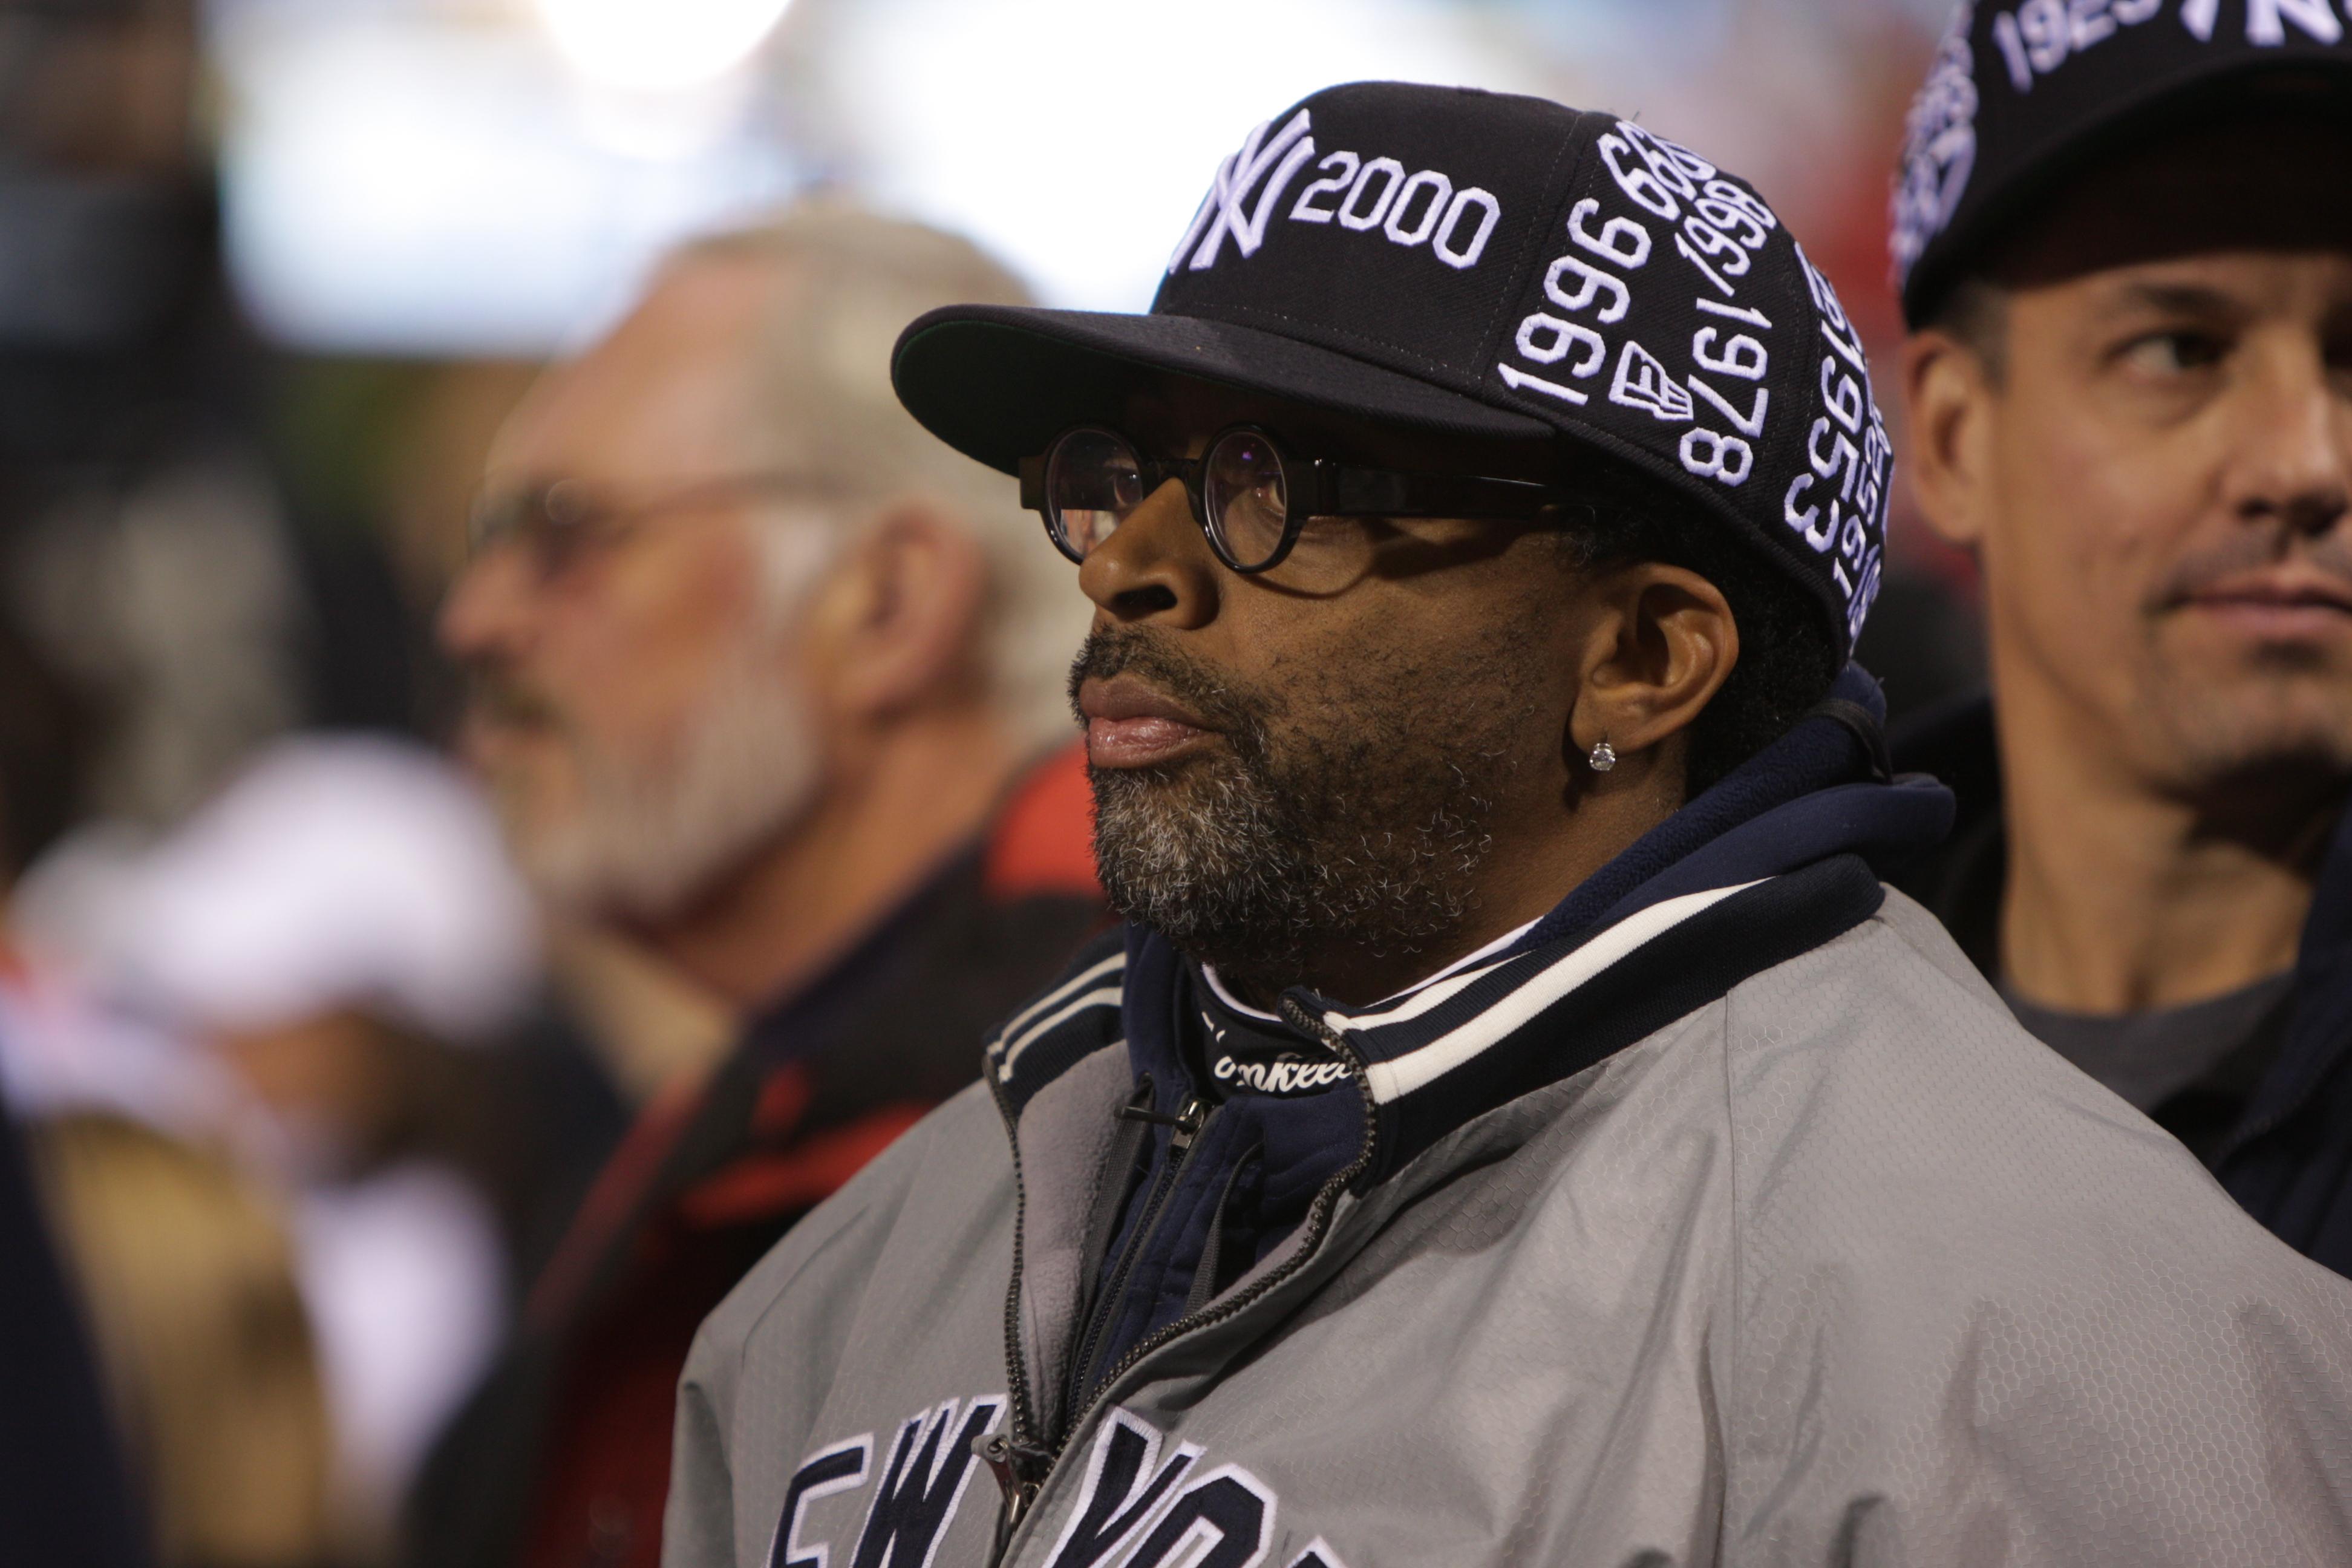 Spike Lee (fot. Melody Joy Kramer / Flickr.com / CC BY-NC-ND 2.0)